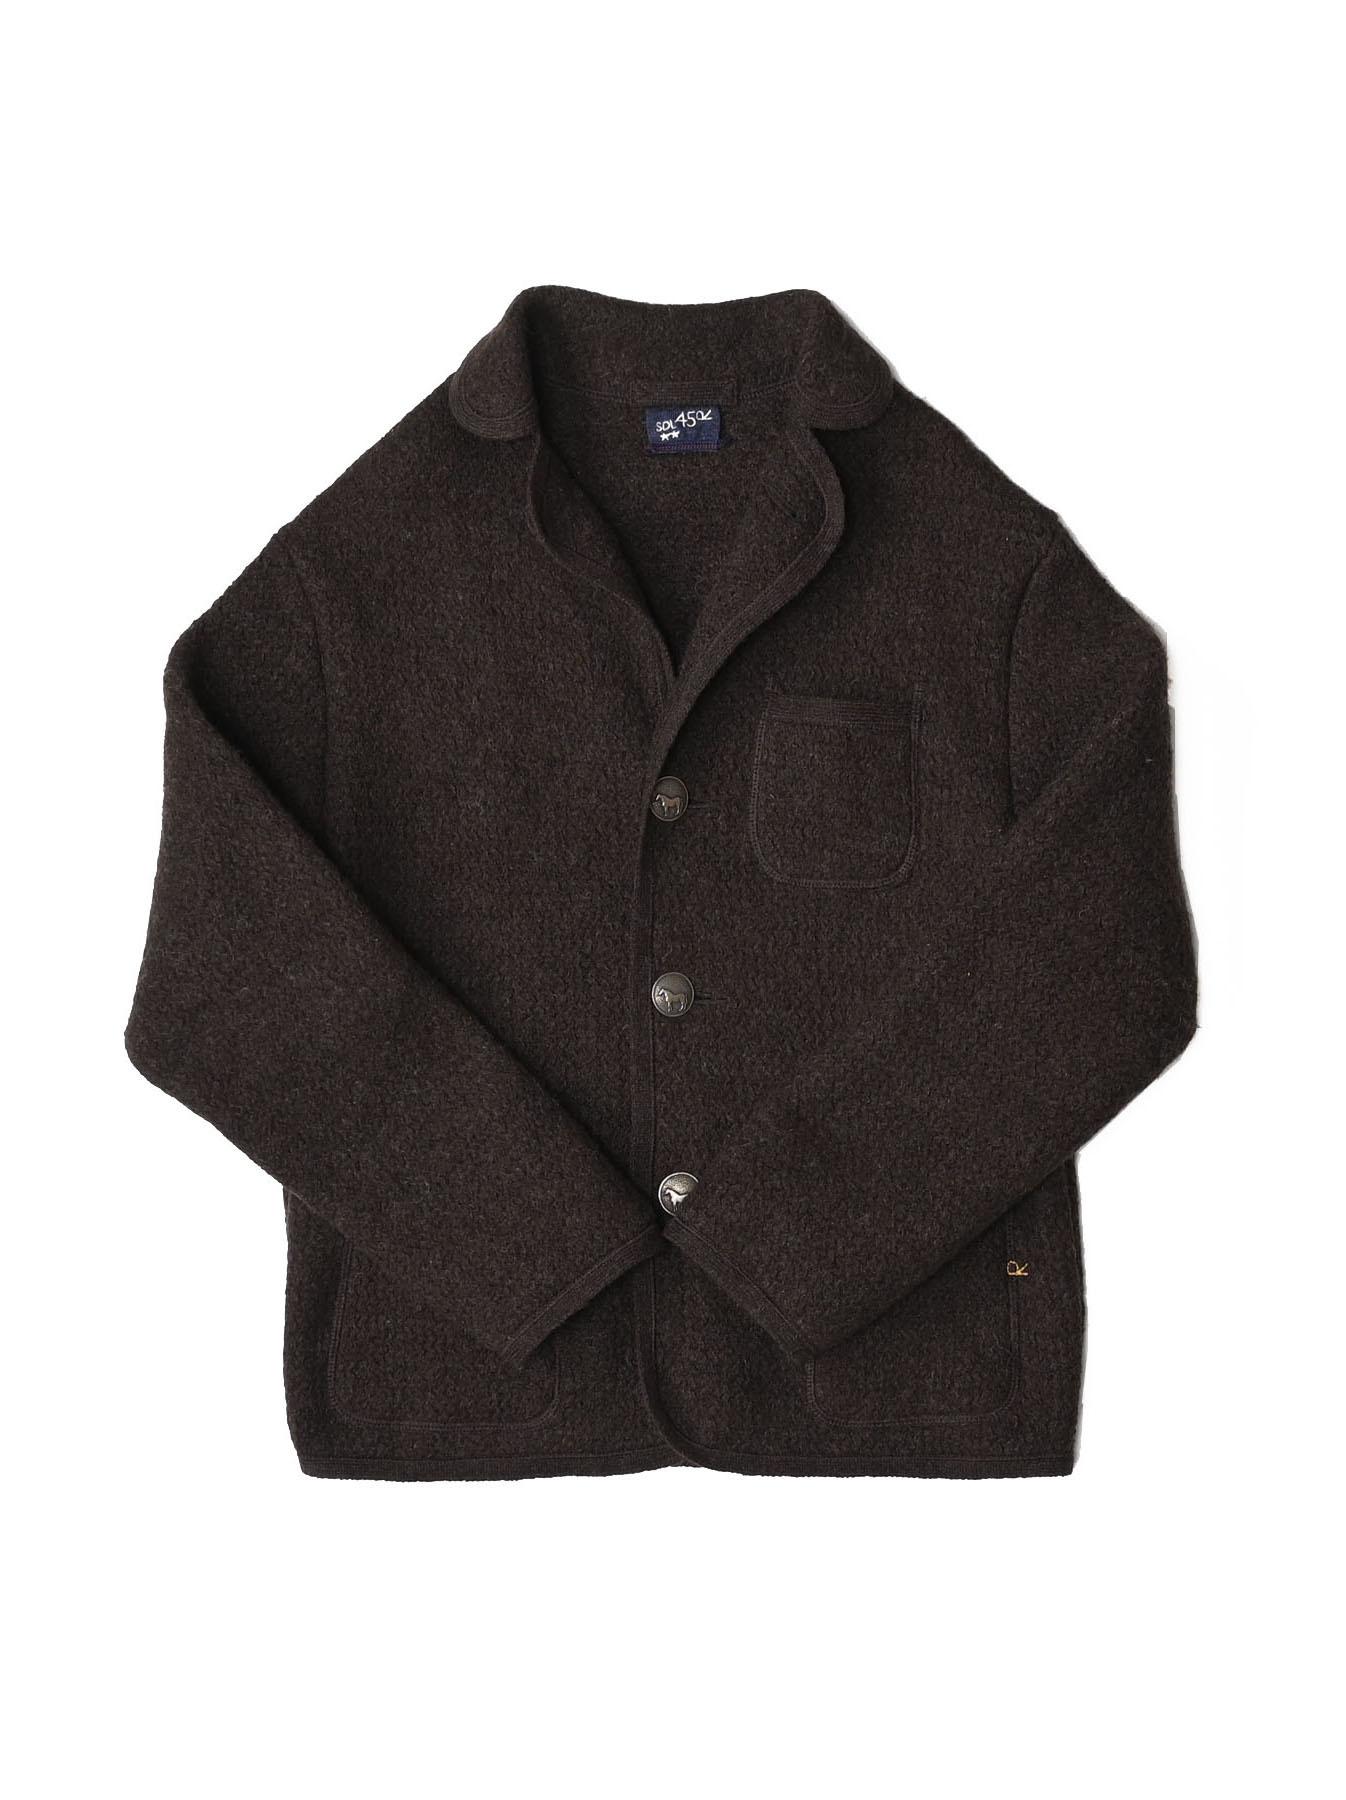 Cotton Shetland 908 Tyrolean Jacket-1